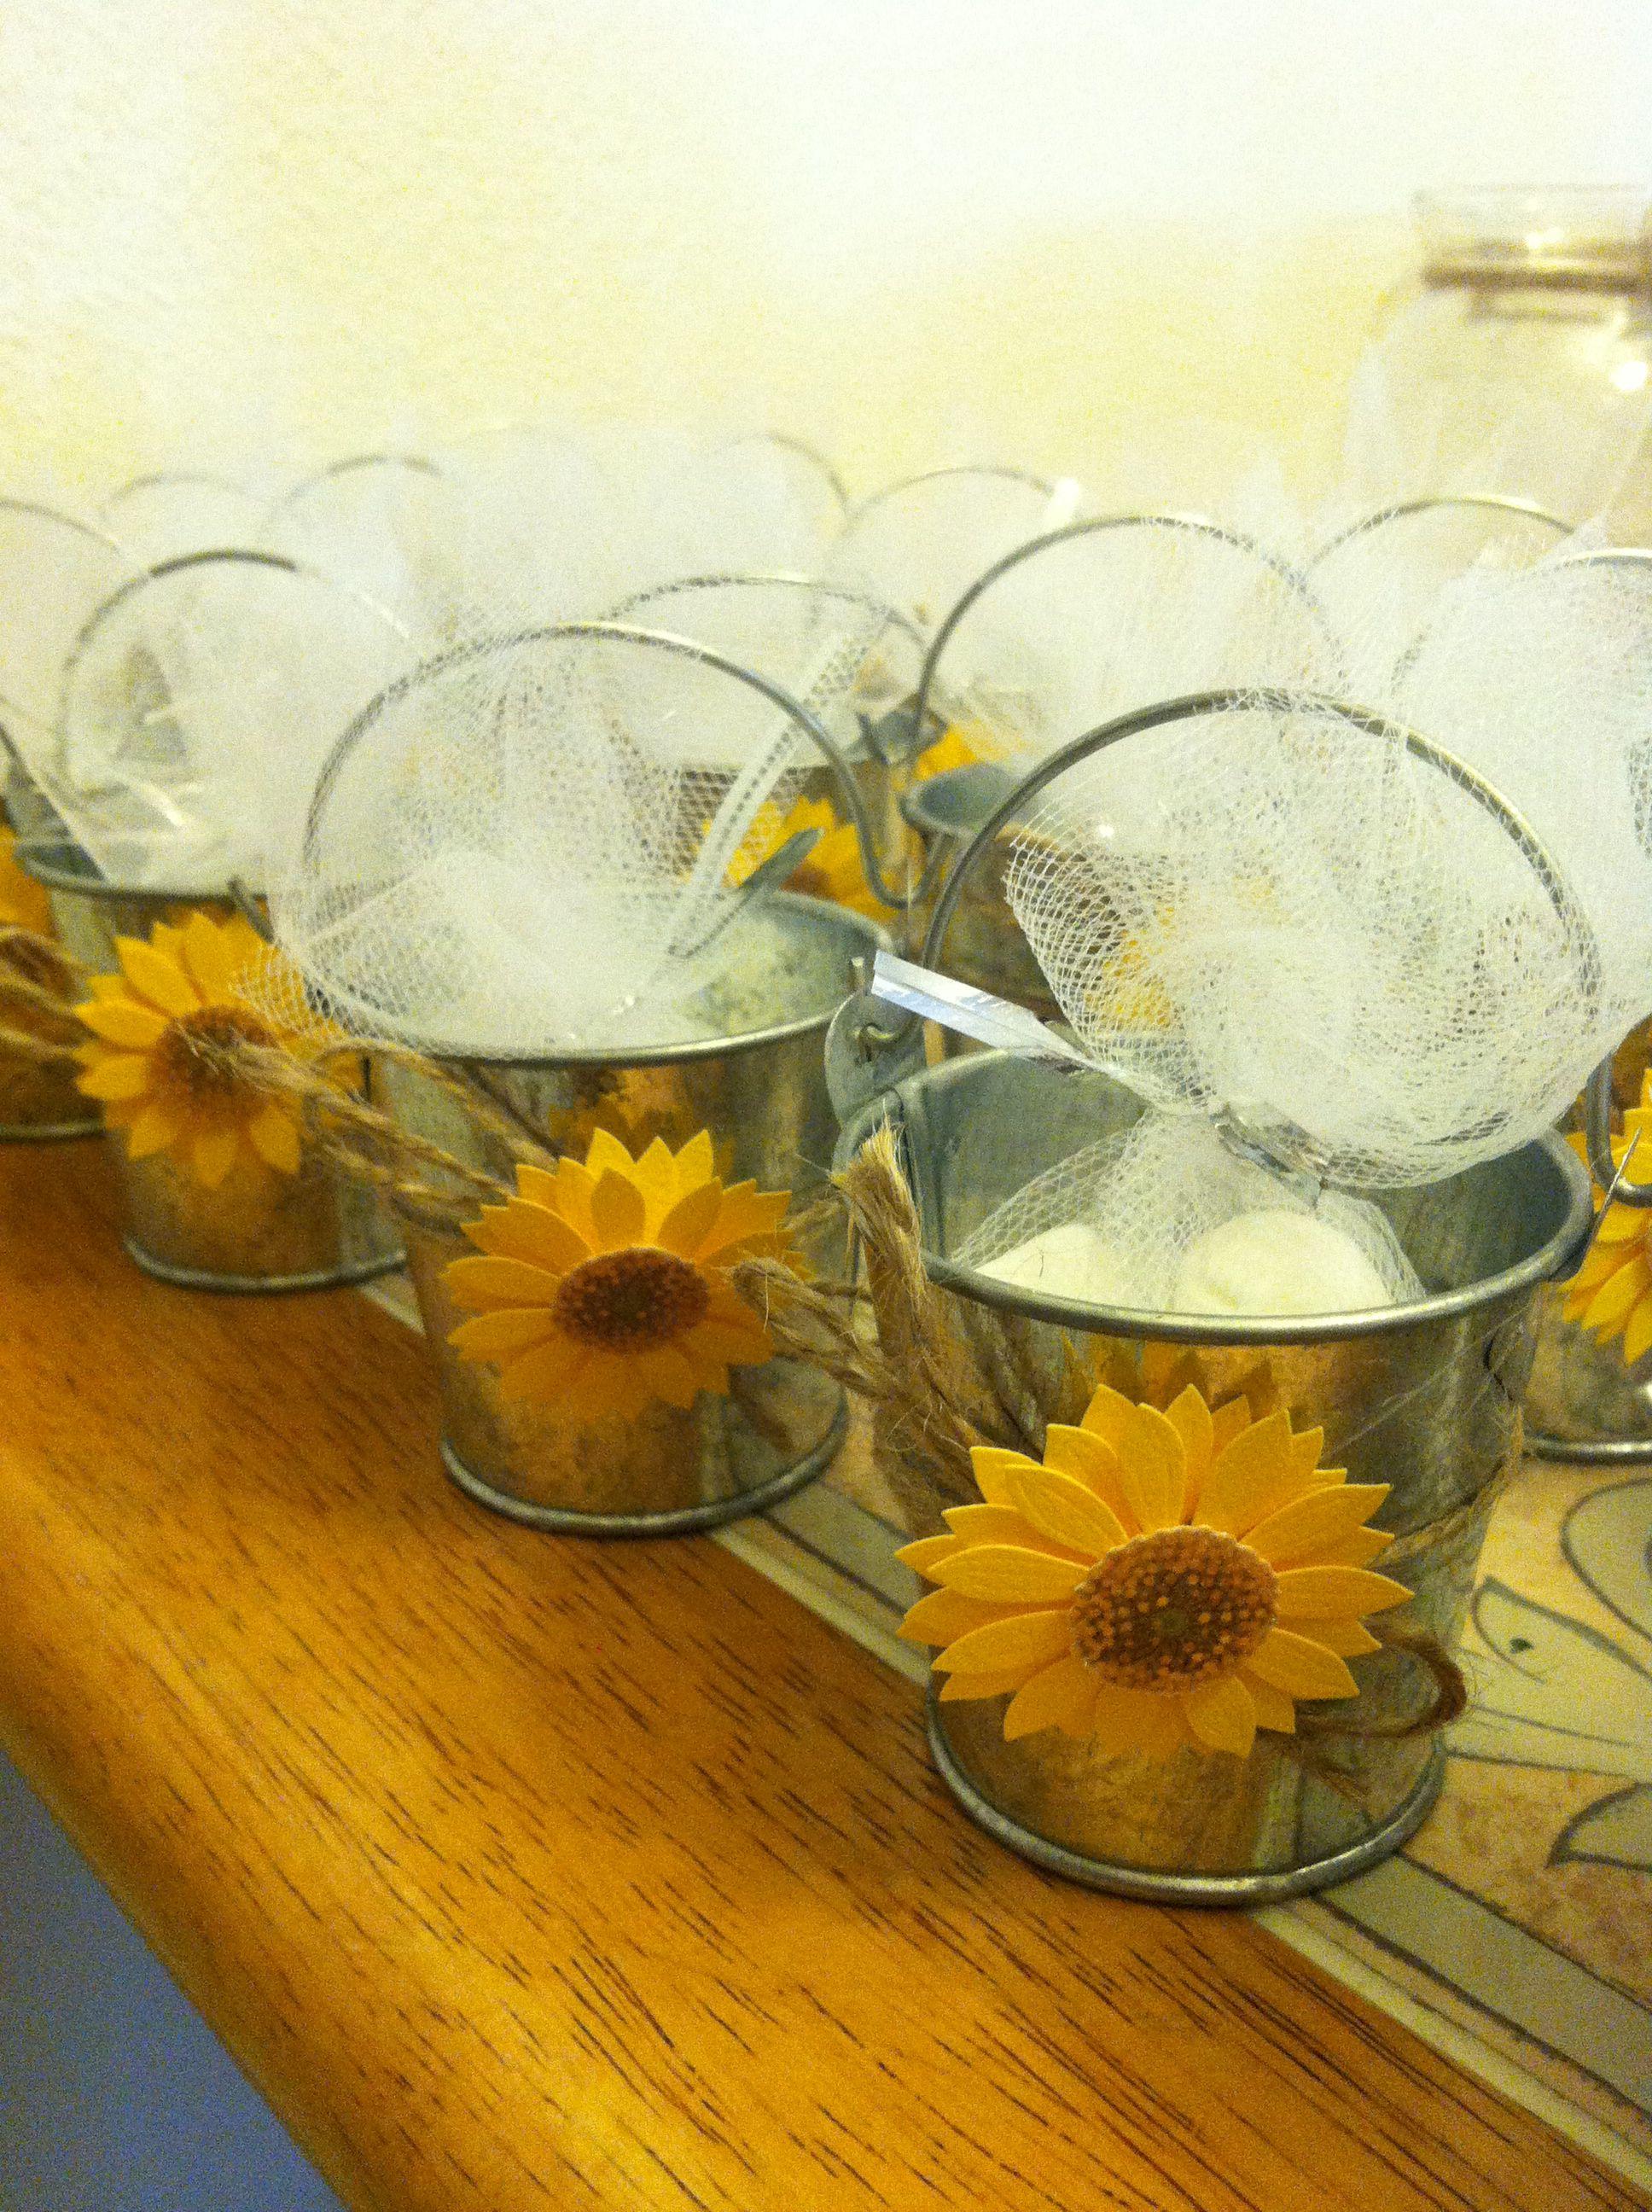 Sunflower wedding favor buckets and flower stickers at